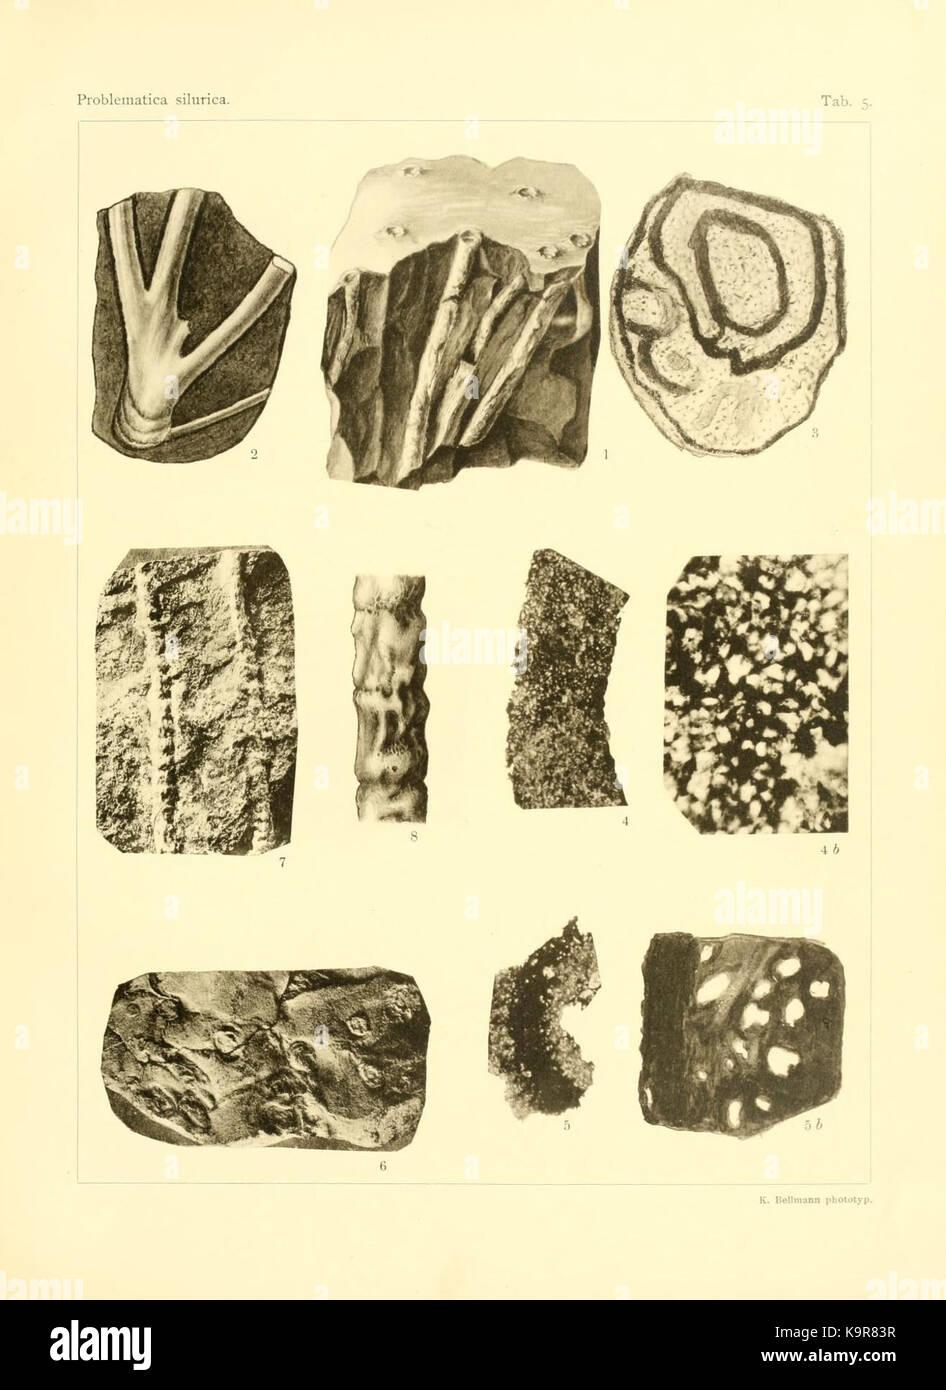 Problematica Silurica (Lámina 5) (7629248204) Foto de stock